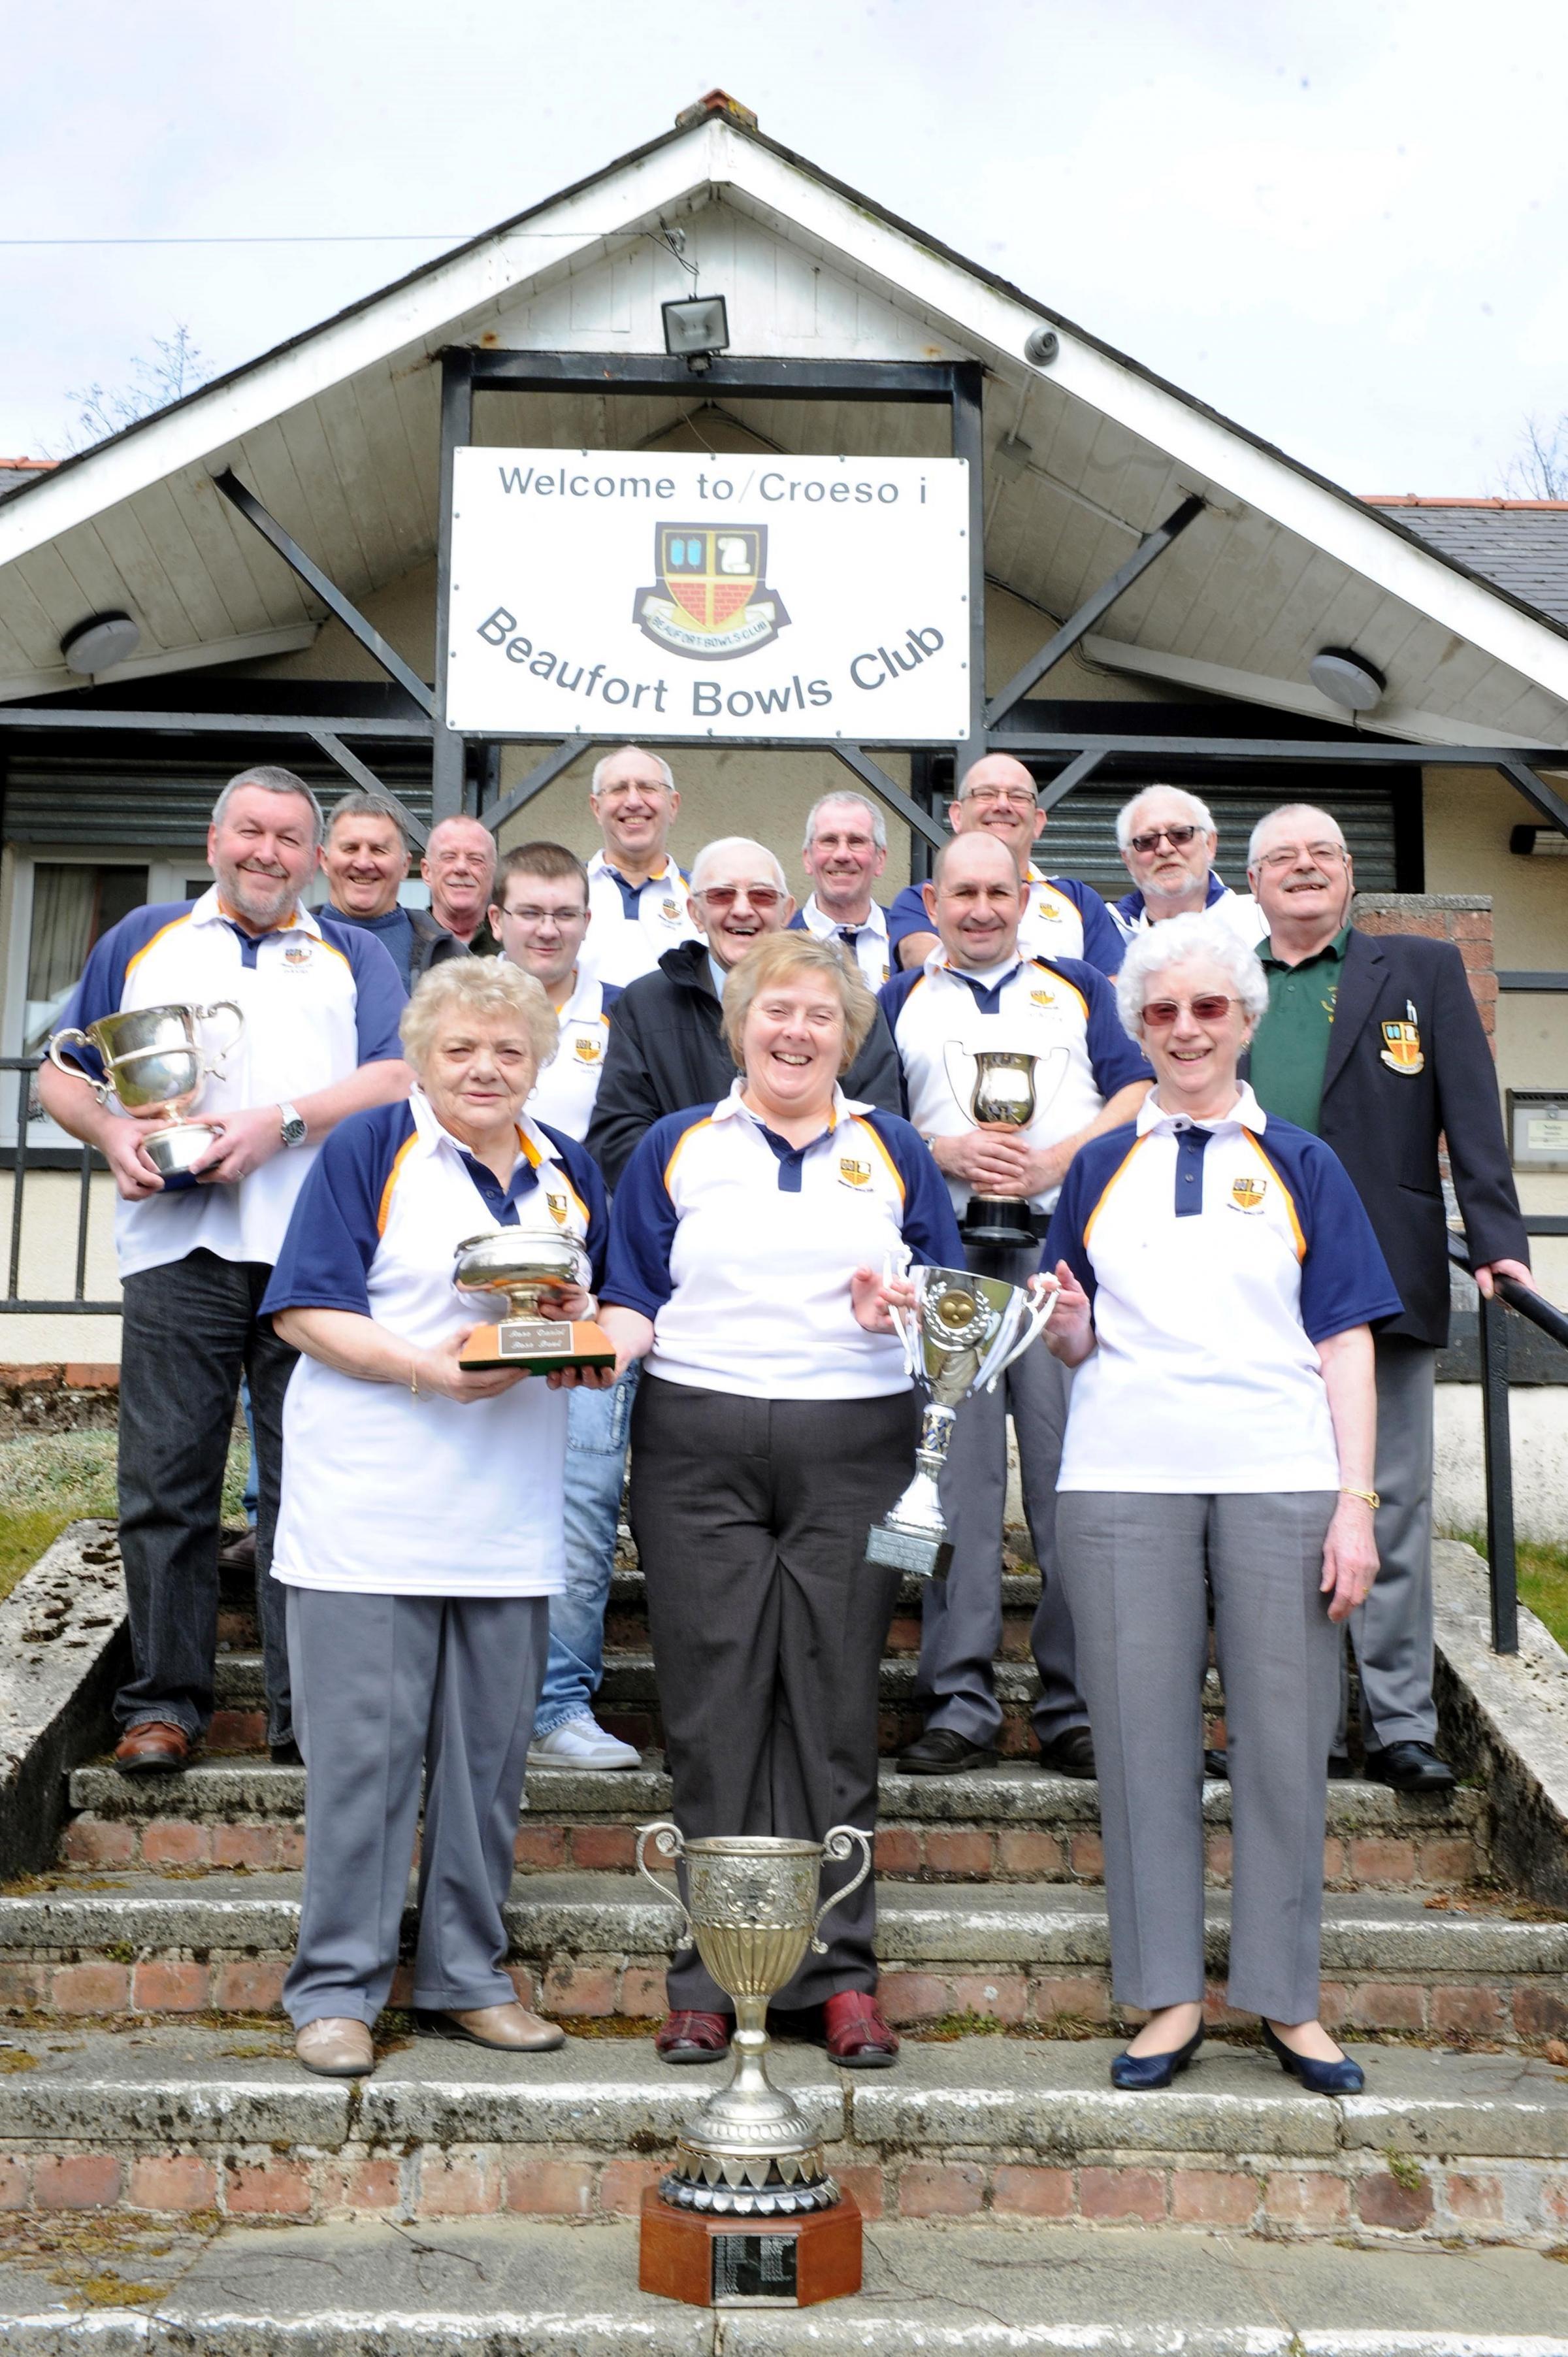 Historic Ebbw Vale bowls club celebrate 90th anniversary